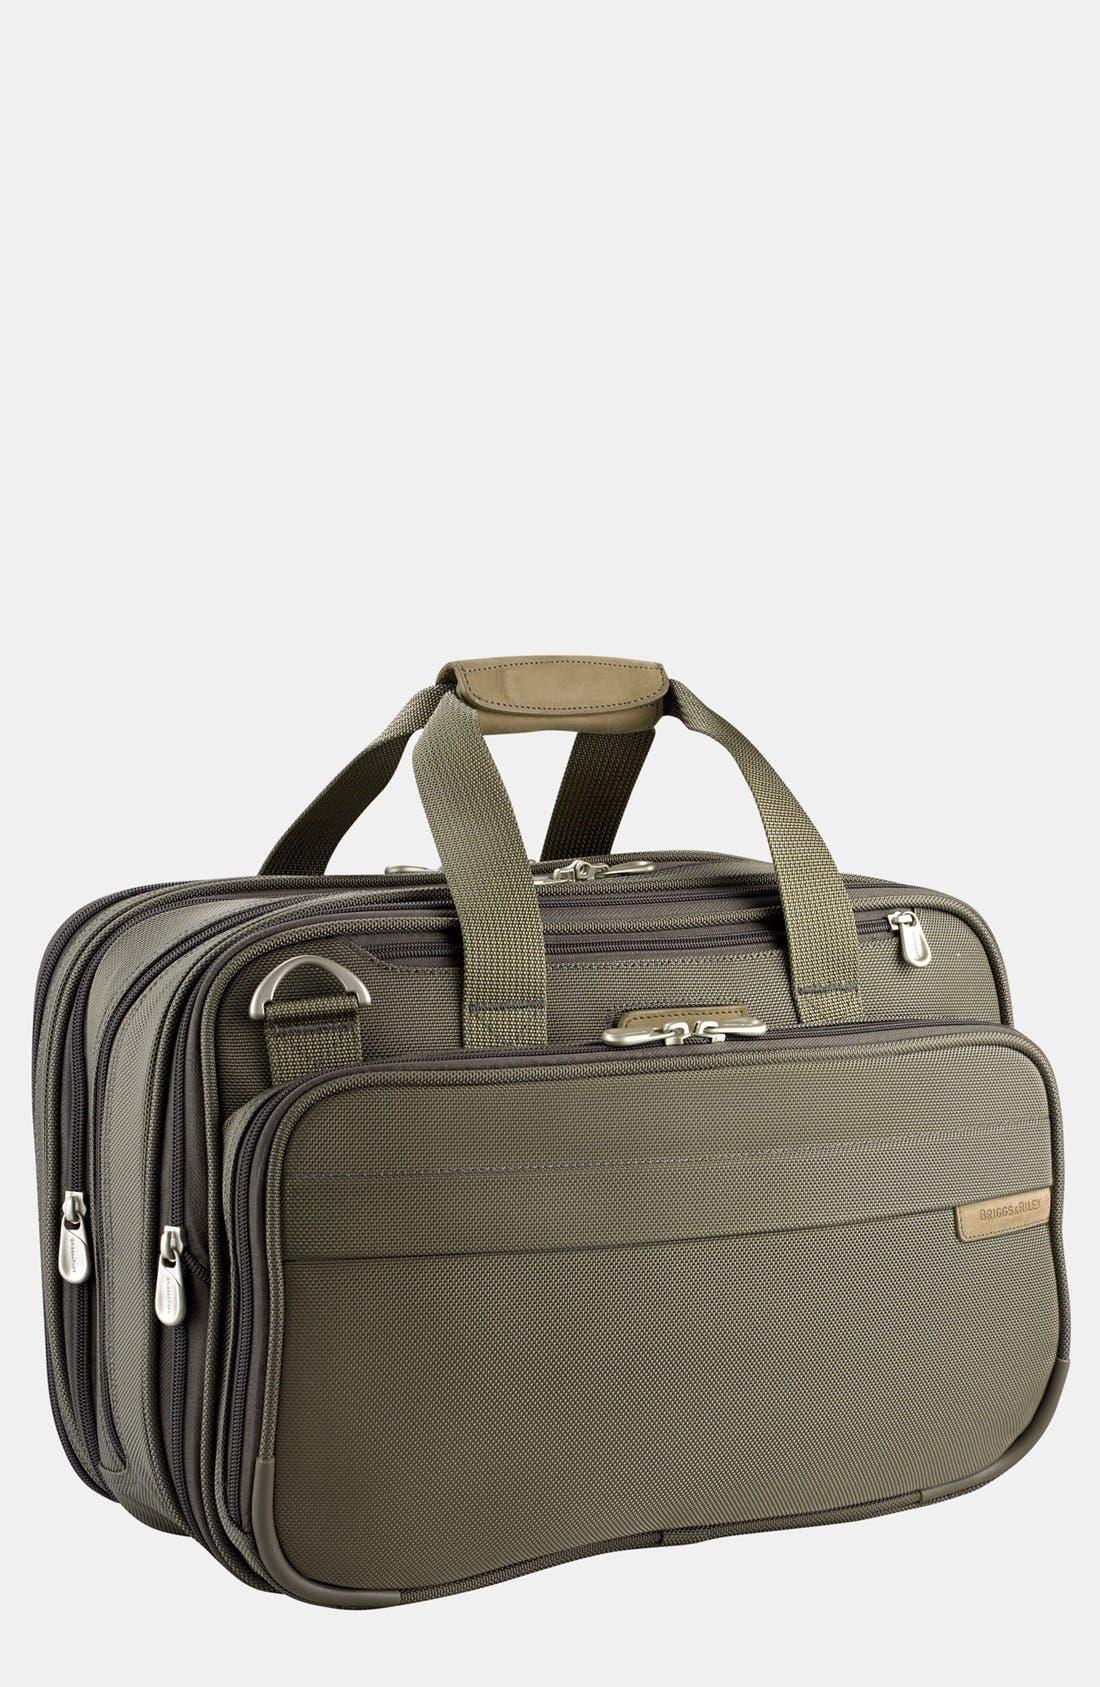 Main Image - Briggs & Riley Expandable Cabin Bag